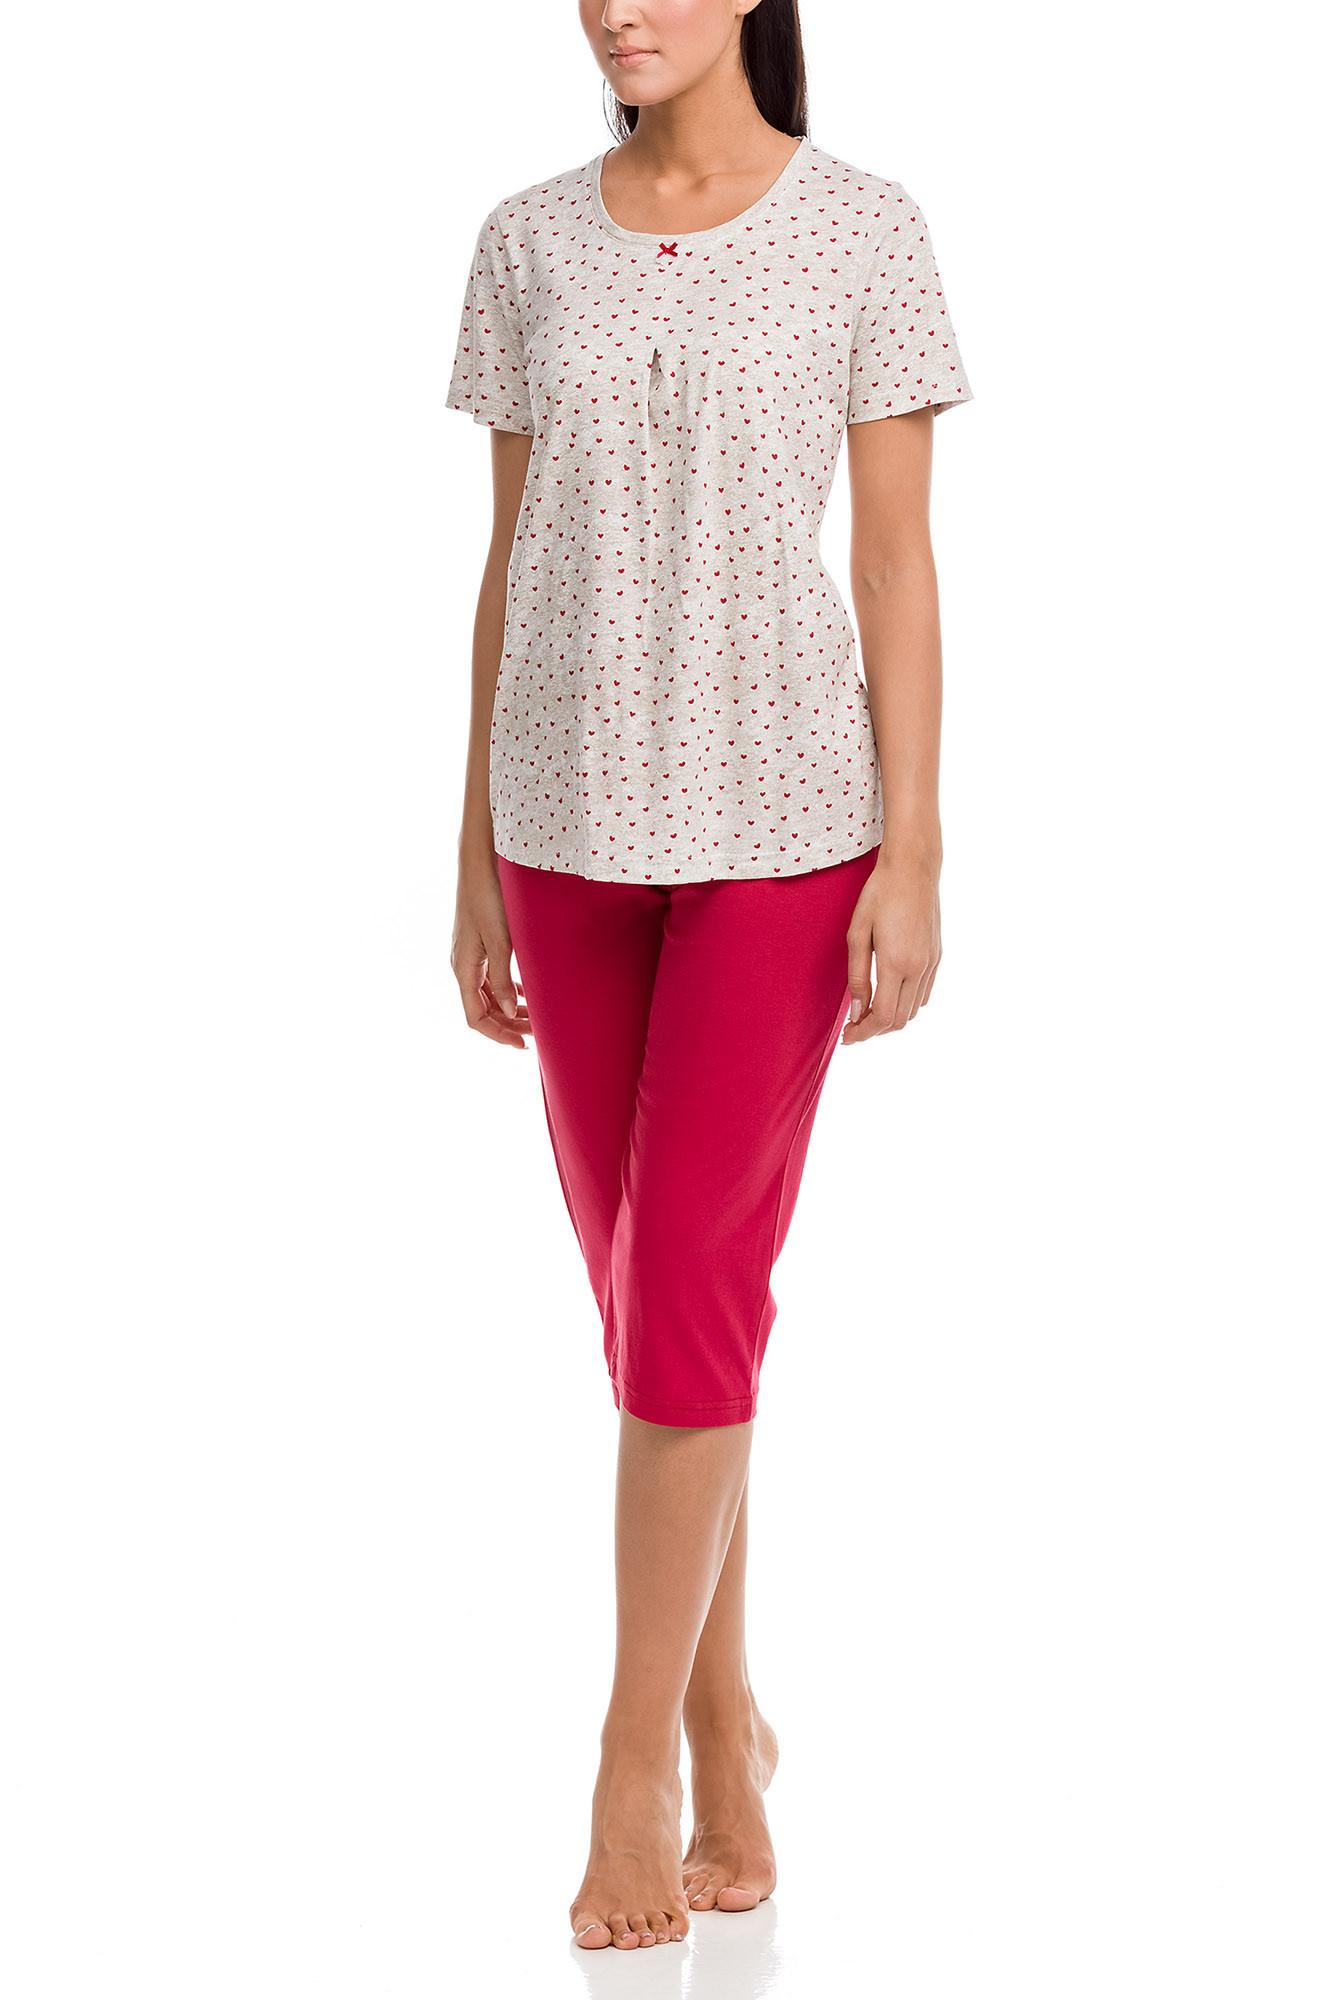 Vamp - Dámske pyžamo 12091 - Vamp beige xxl